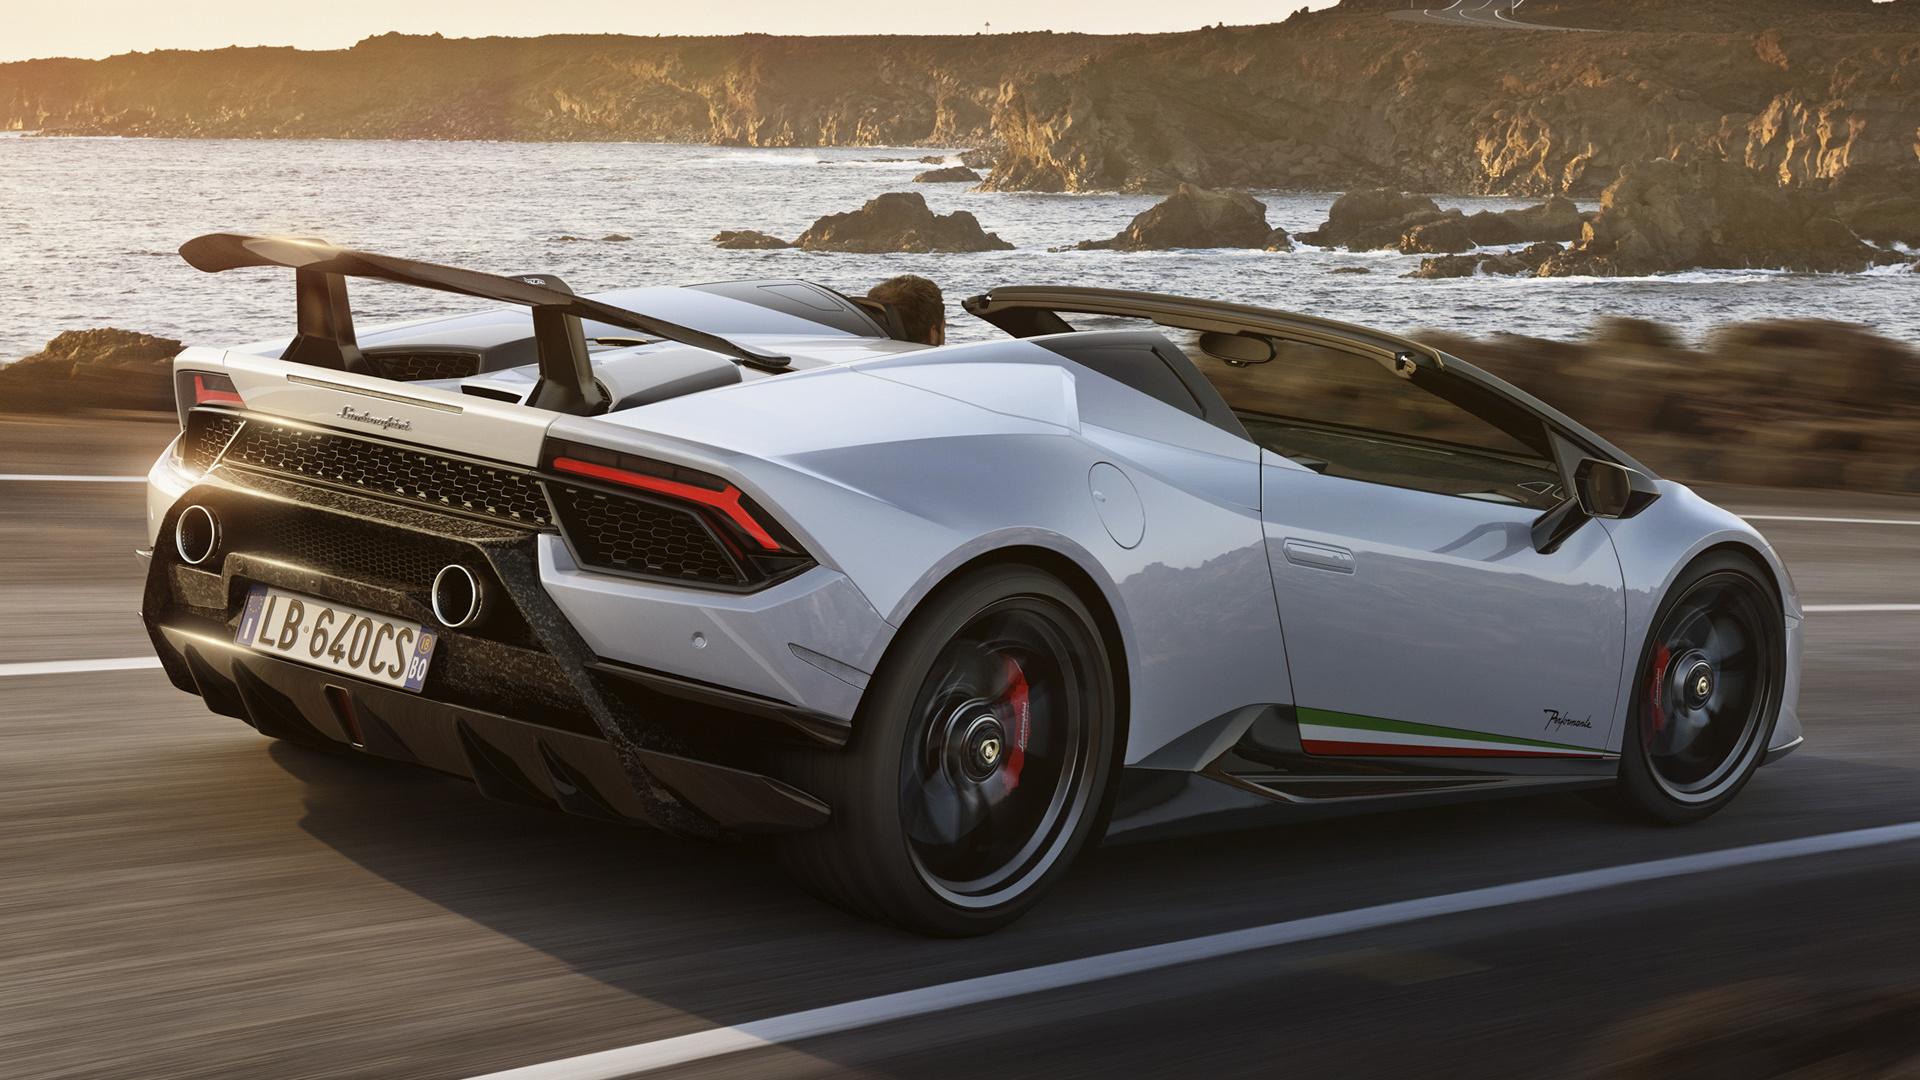 2018 Lamborghini Huracan Performante Spyder   Wallpapers and HD 1920x1080